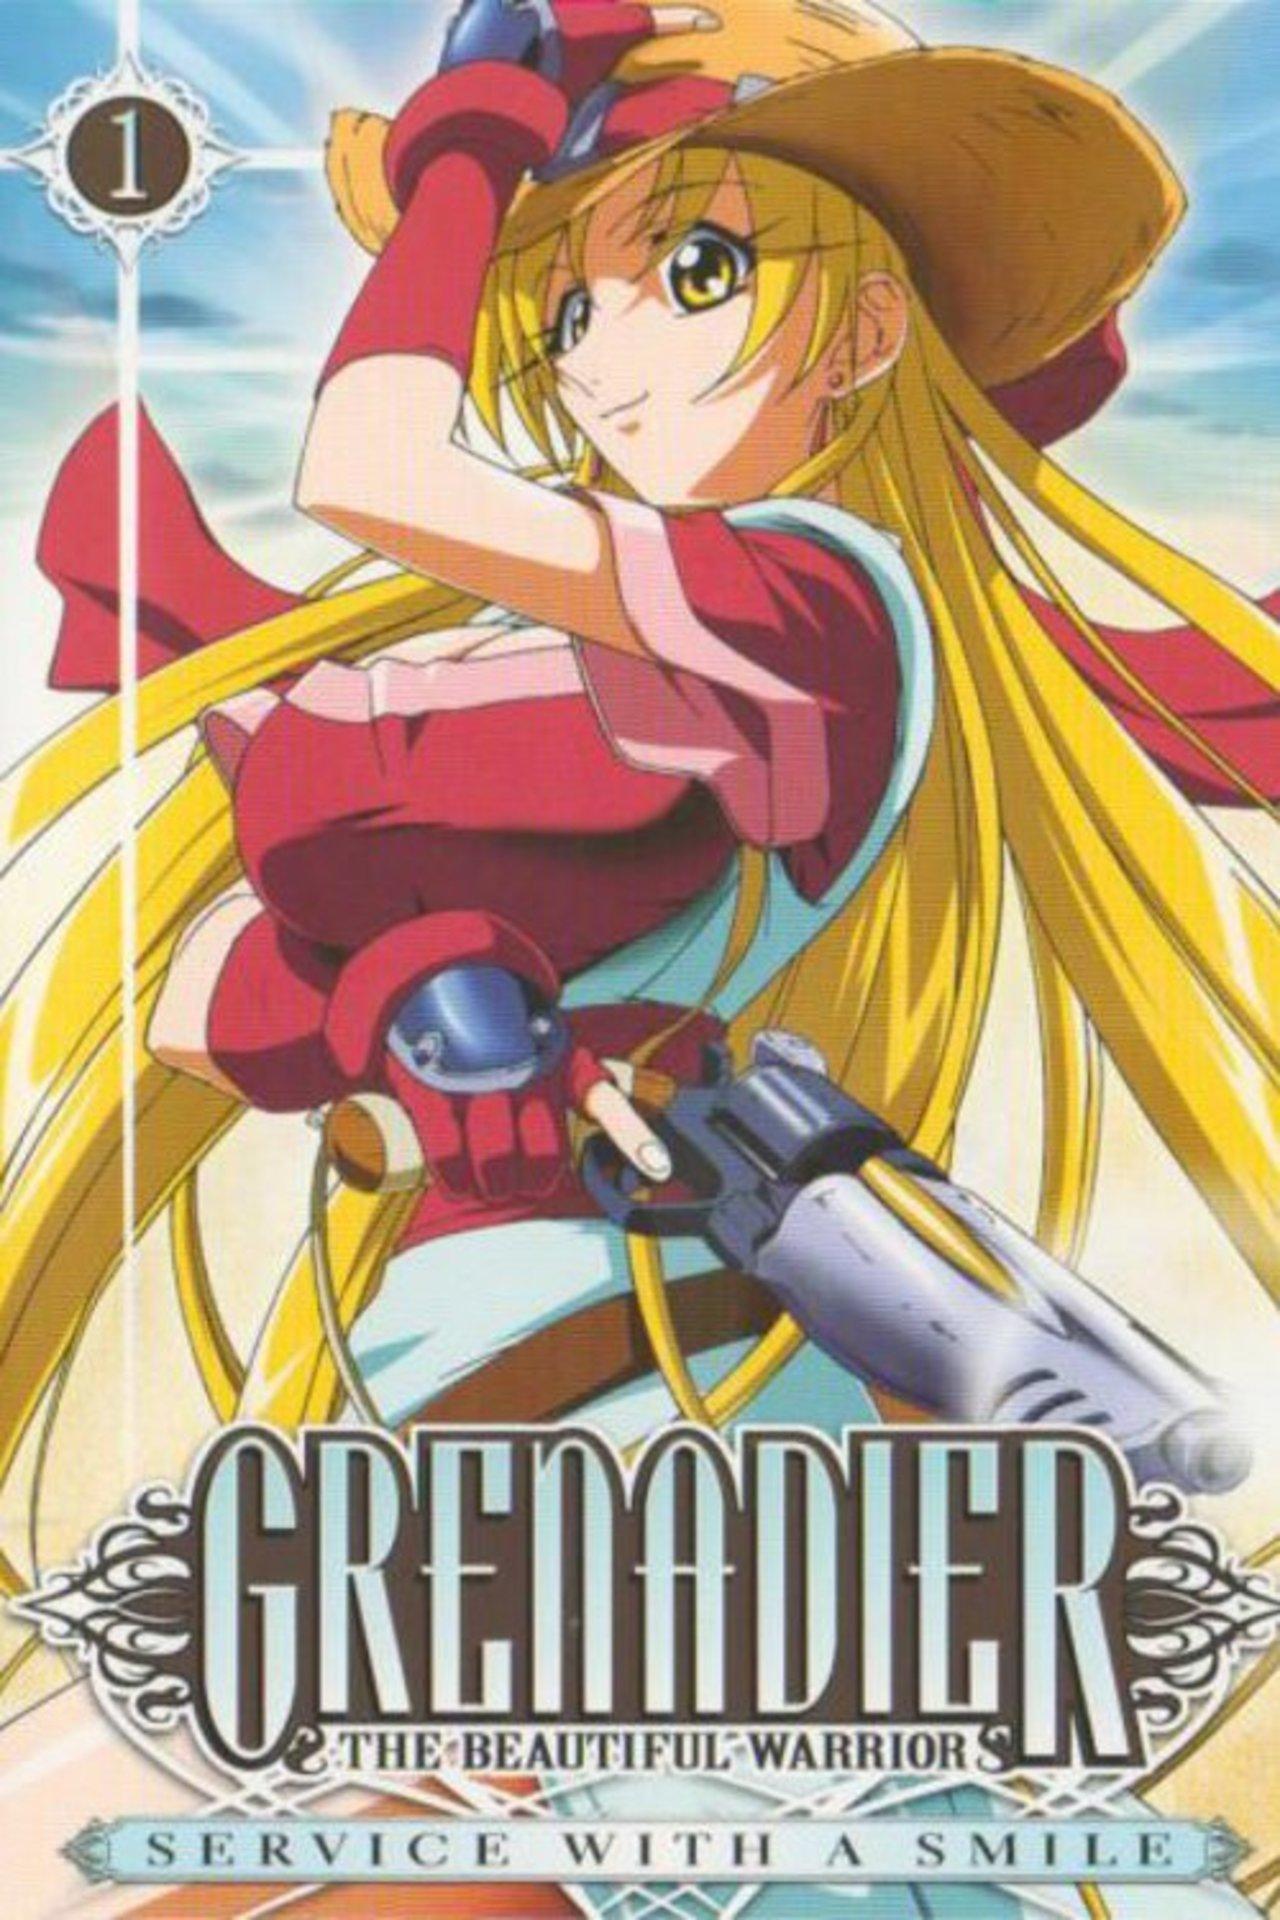 Grenadier: Hohoemi no senshi kapak